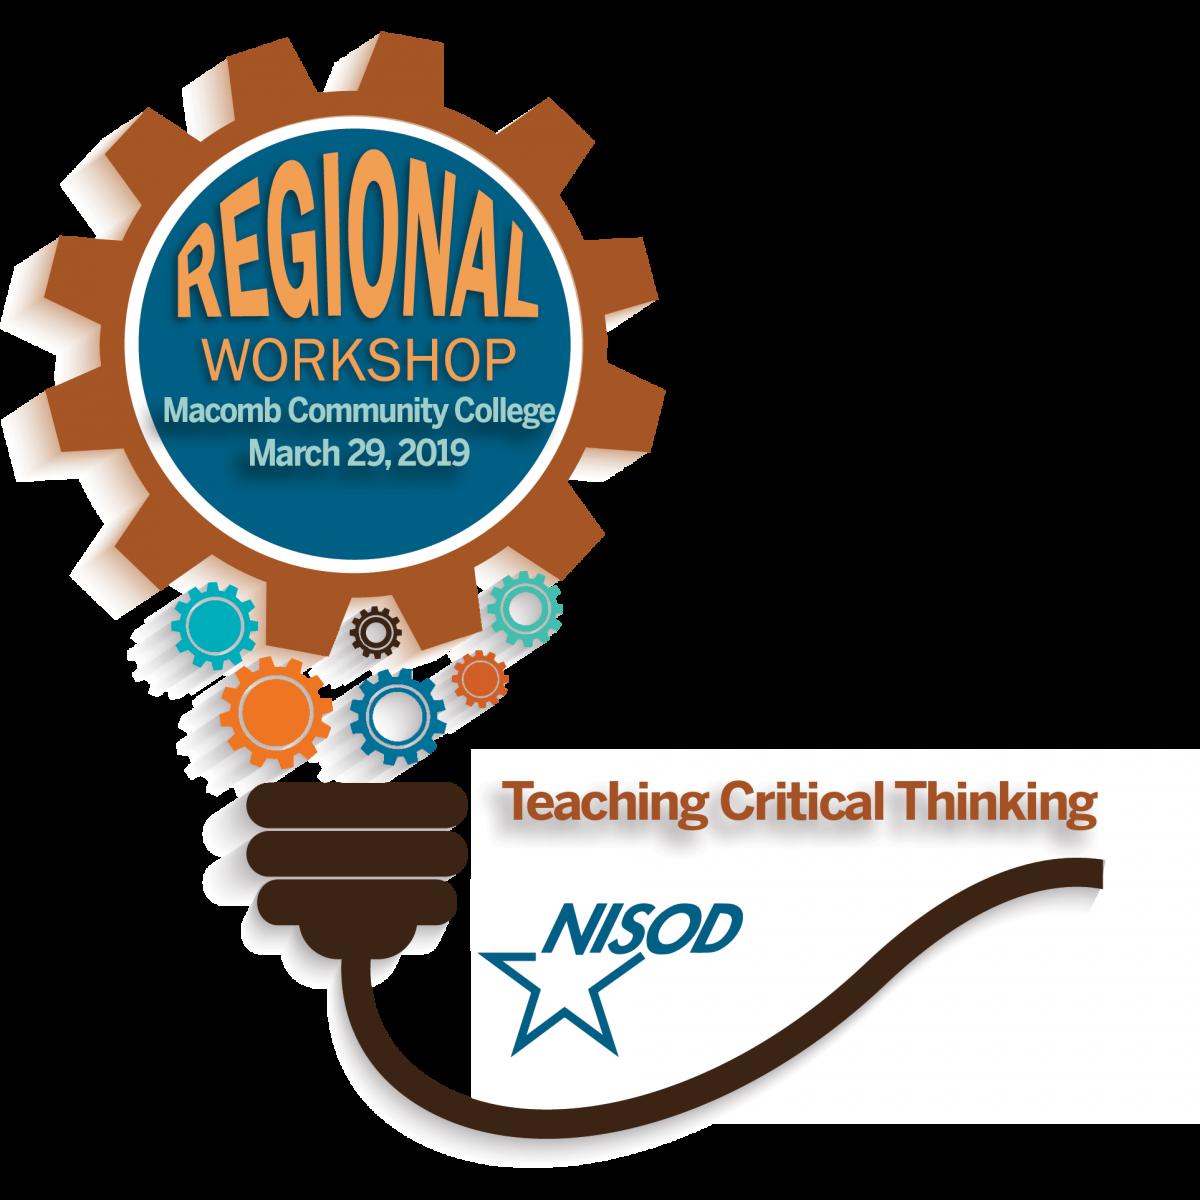 Macomb Community College Regional Workshop logo